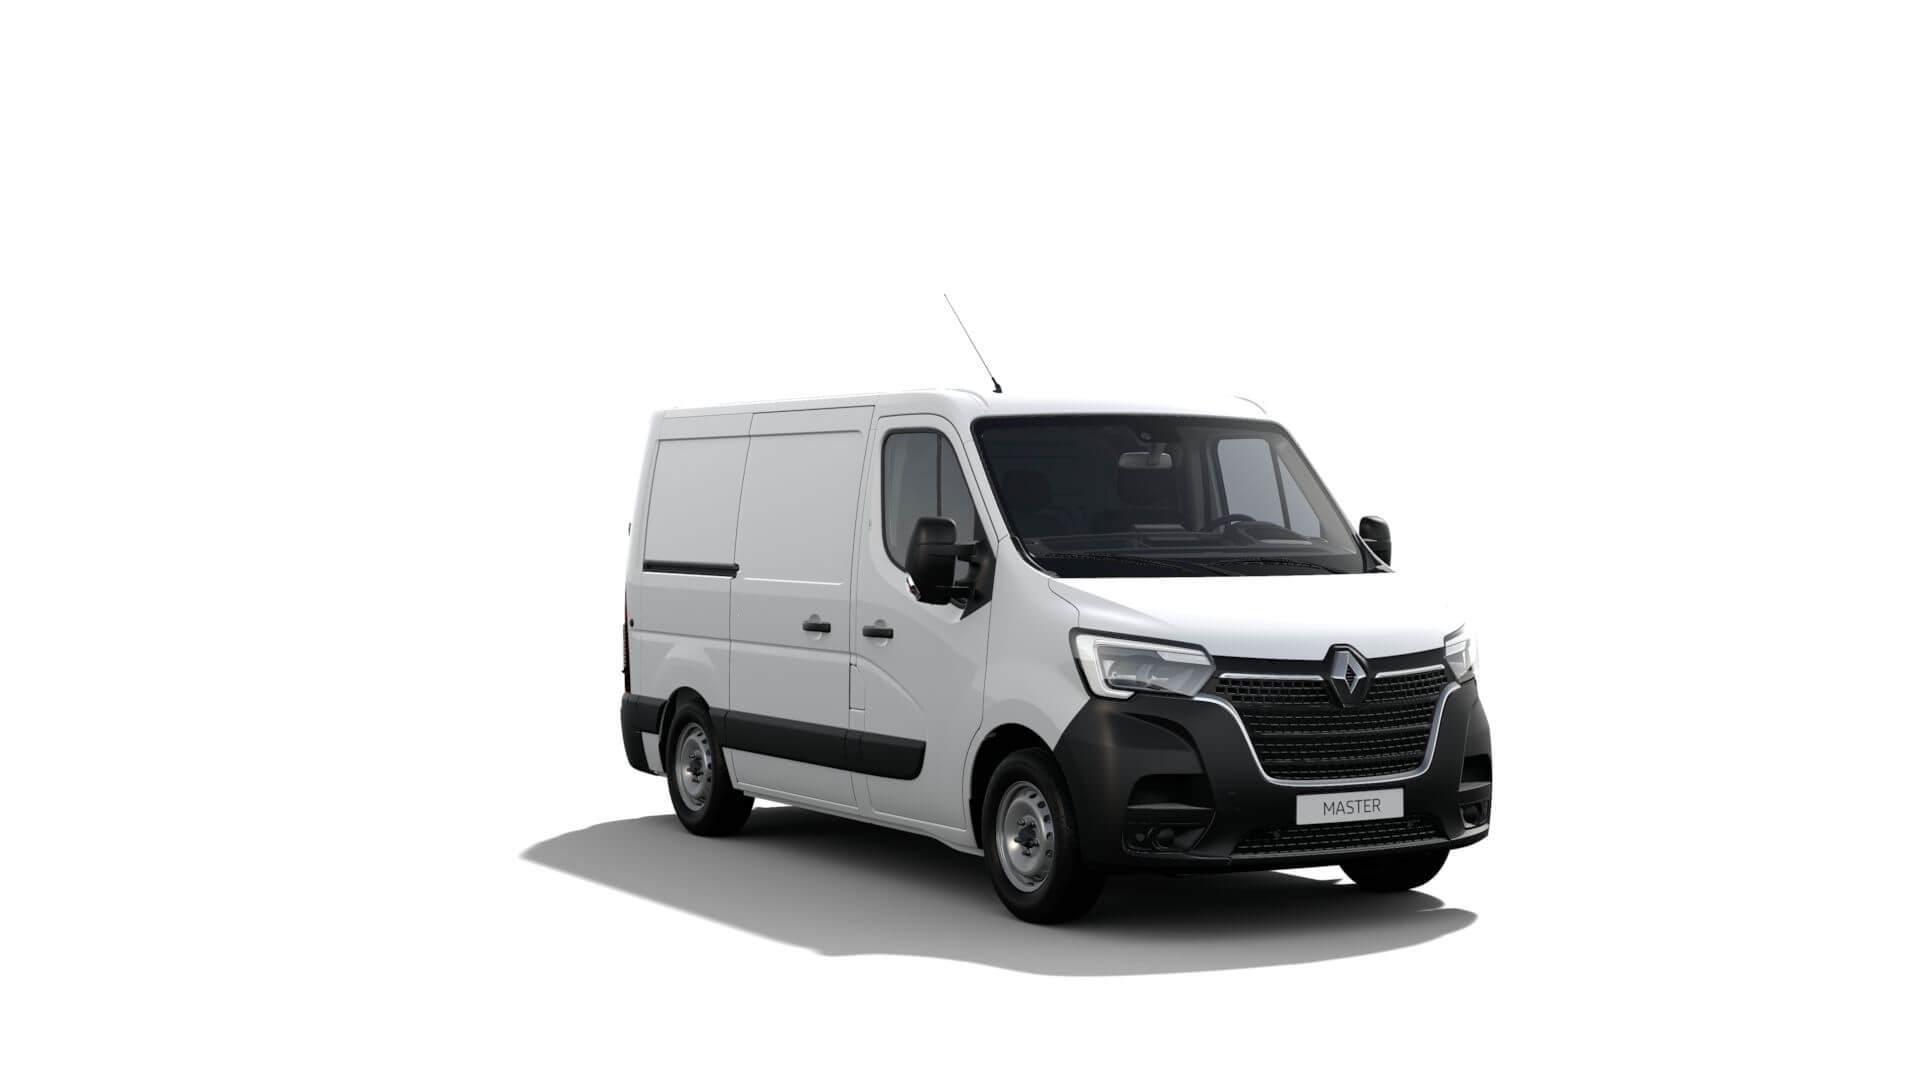 Automodell Sprinter weiß - Renault NFZ Master - Renault Ahrens Hannover